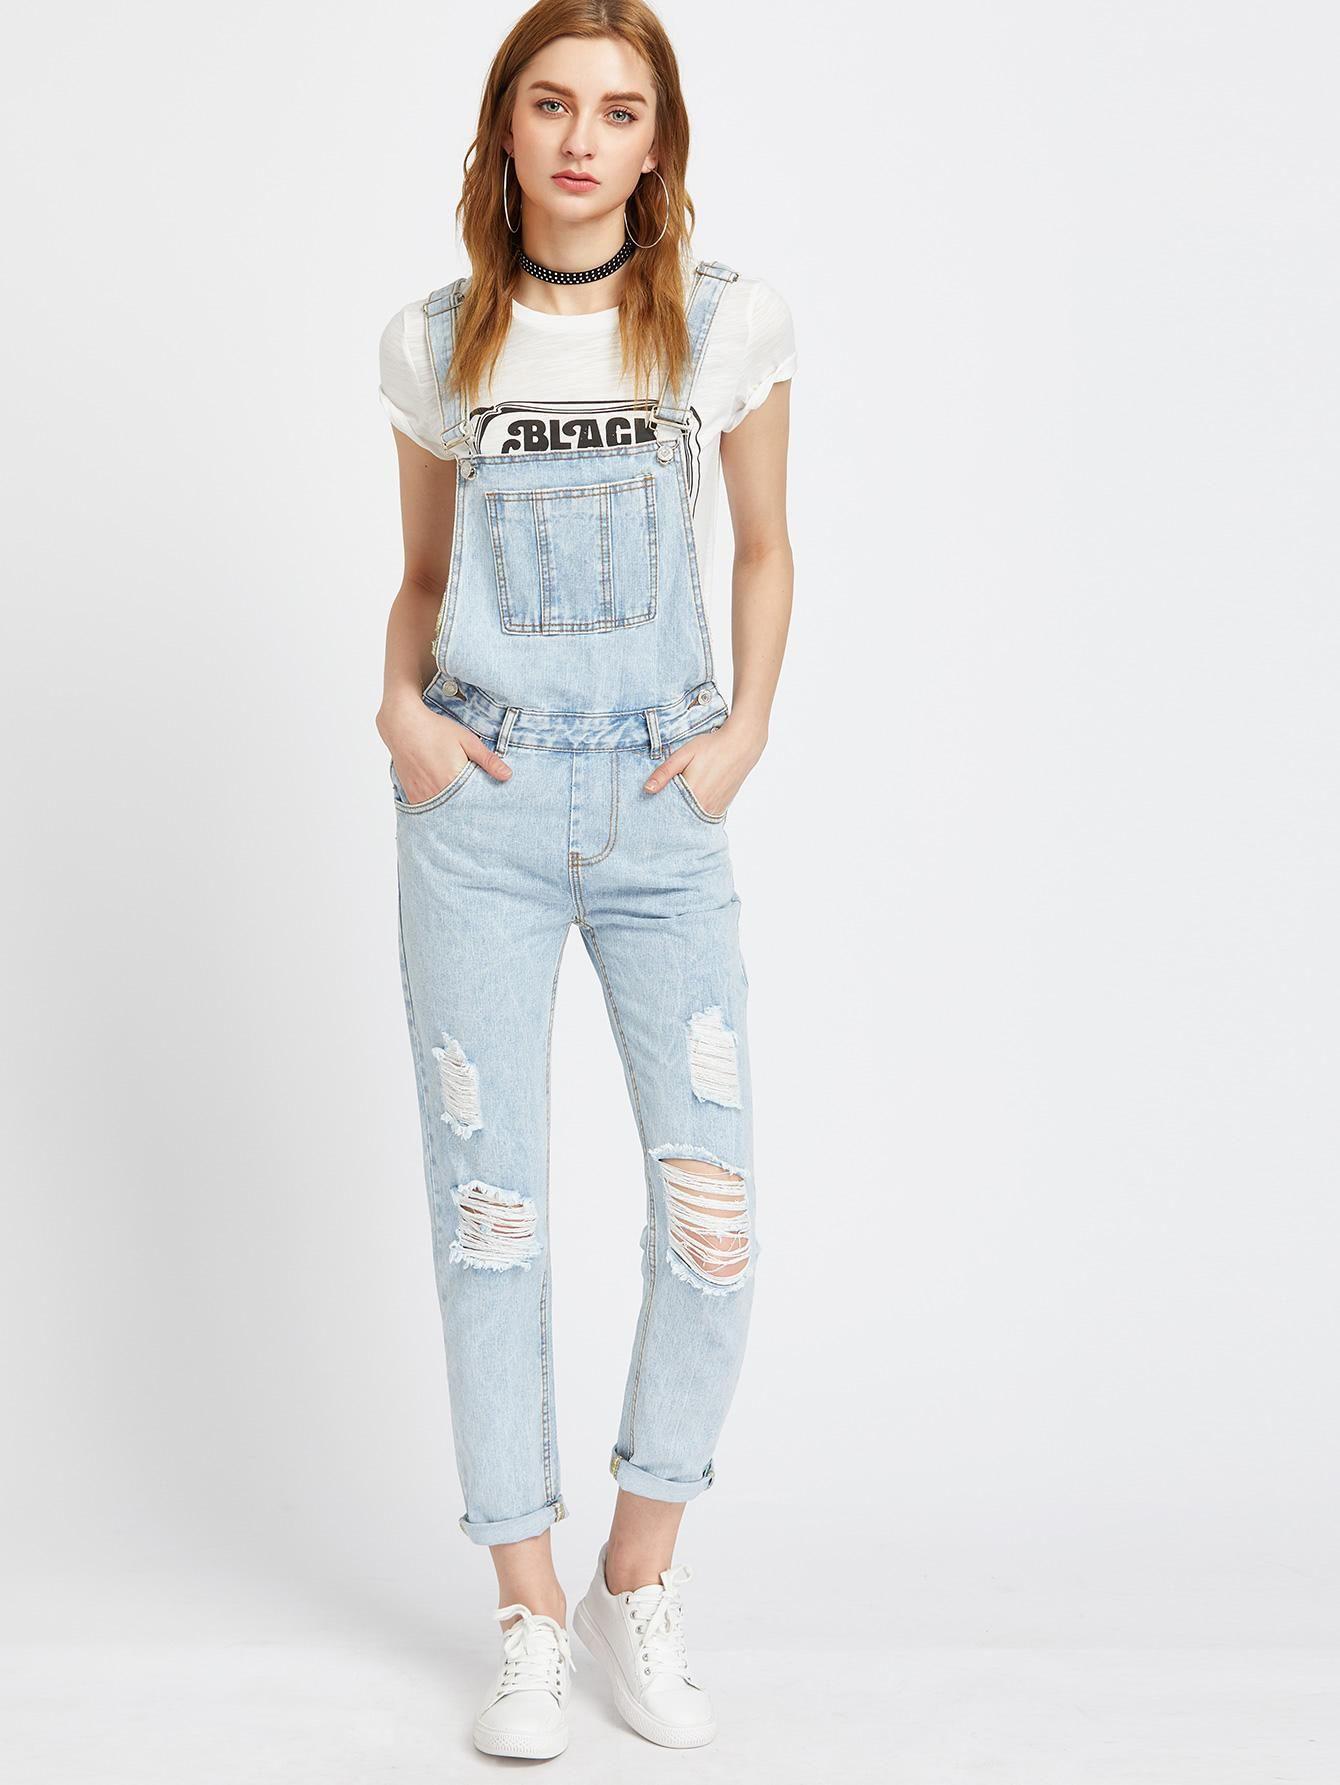 5a80346ed521 SheIn - SheIn Light Blue Ripped Bleach Wash Cuffed Overall Jeans -  AdoreWe.com